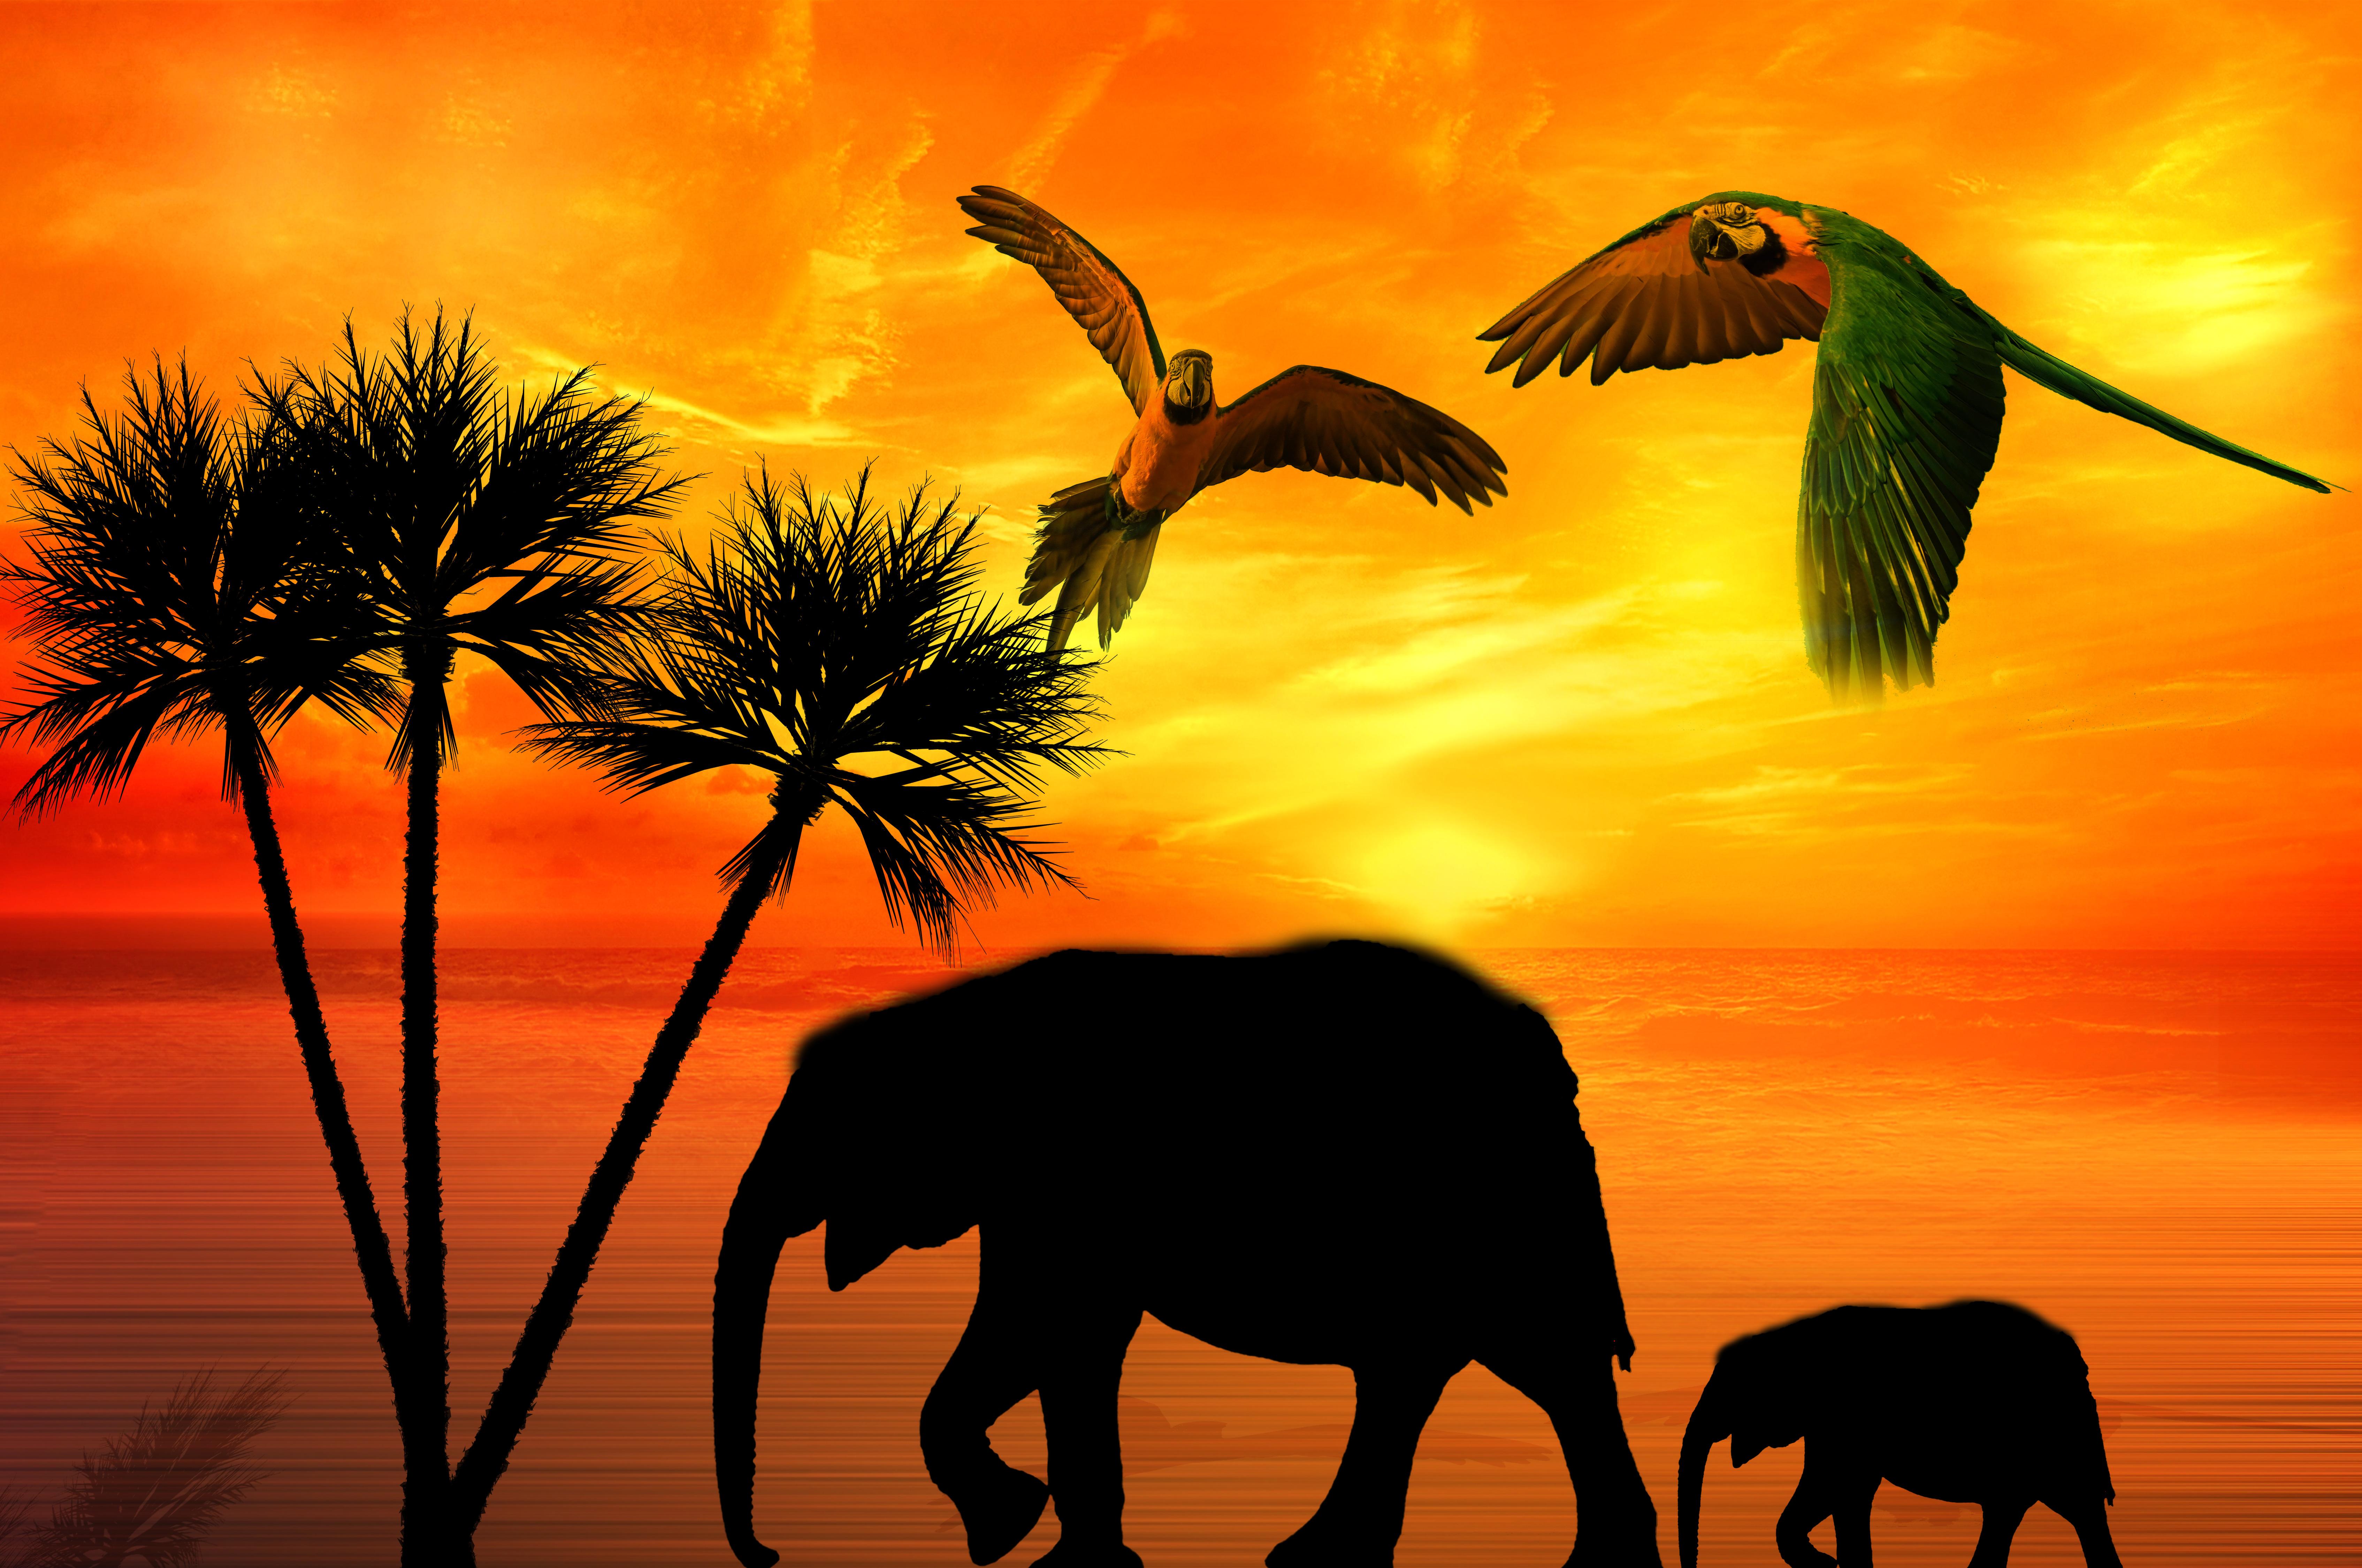 Free Images Animals Africa Palms Ara Parrot Bird